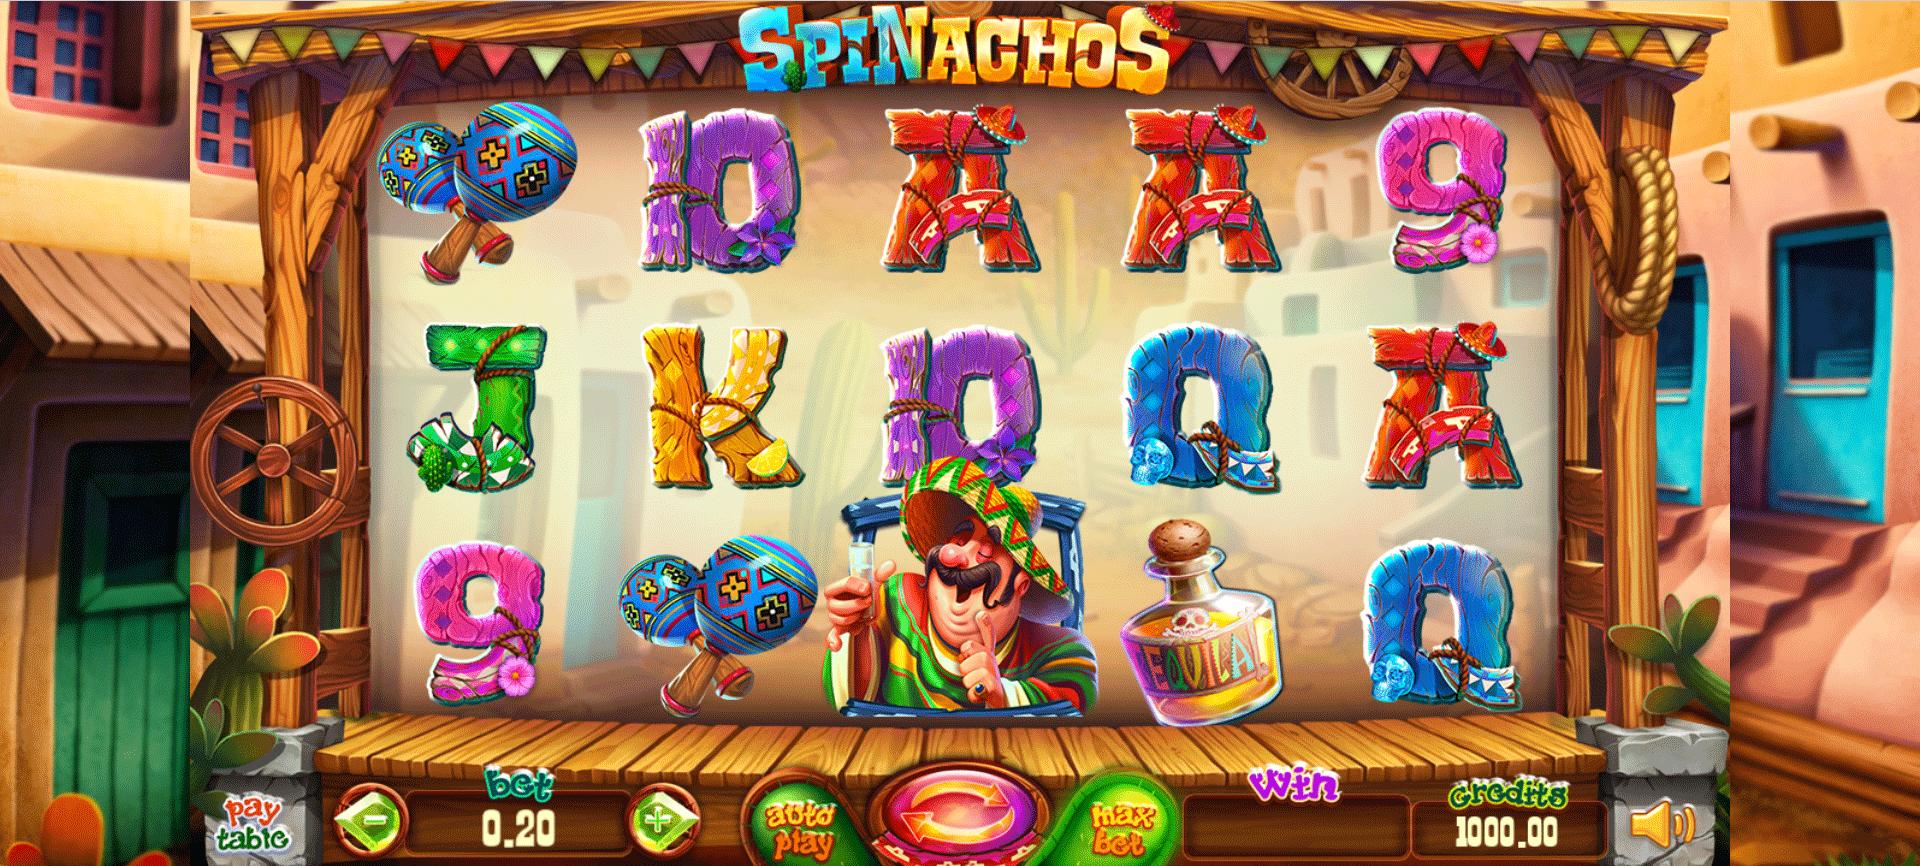 Slot Spinachos